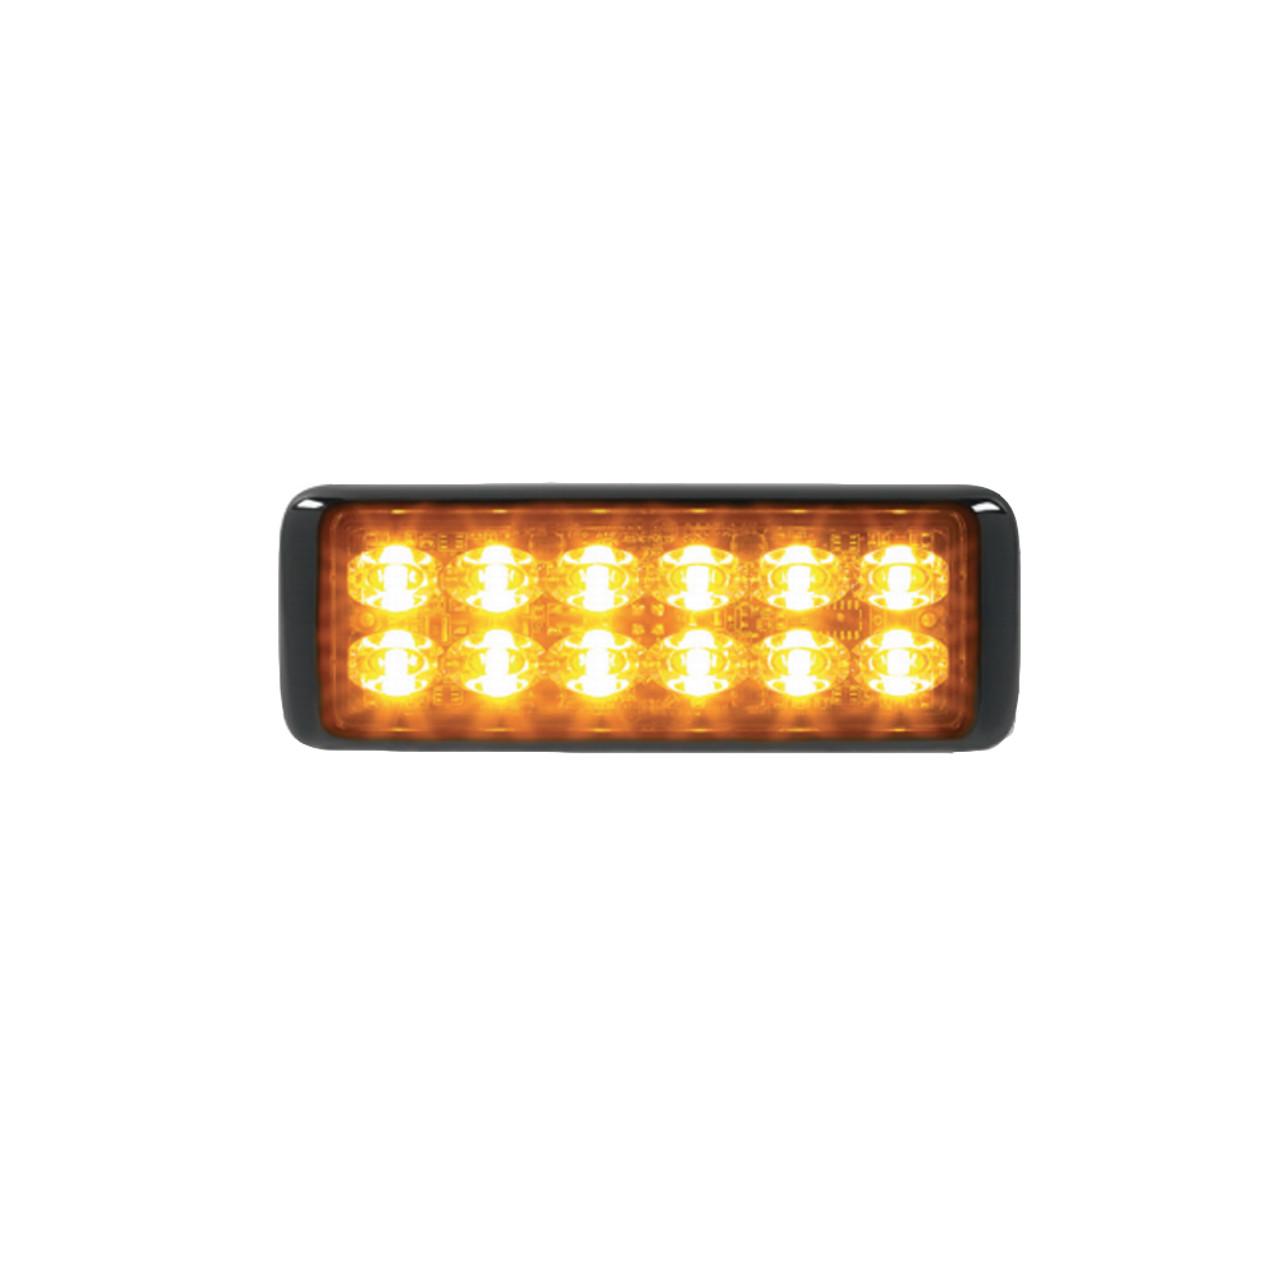 Federal Signal MicroPulse Ultra Thin 12 LED Surface Flush Mount Light Head, MPS1200U